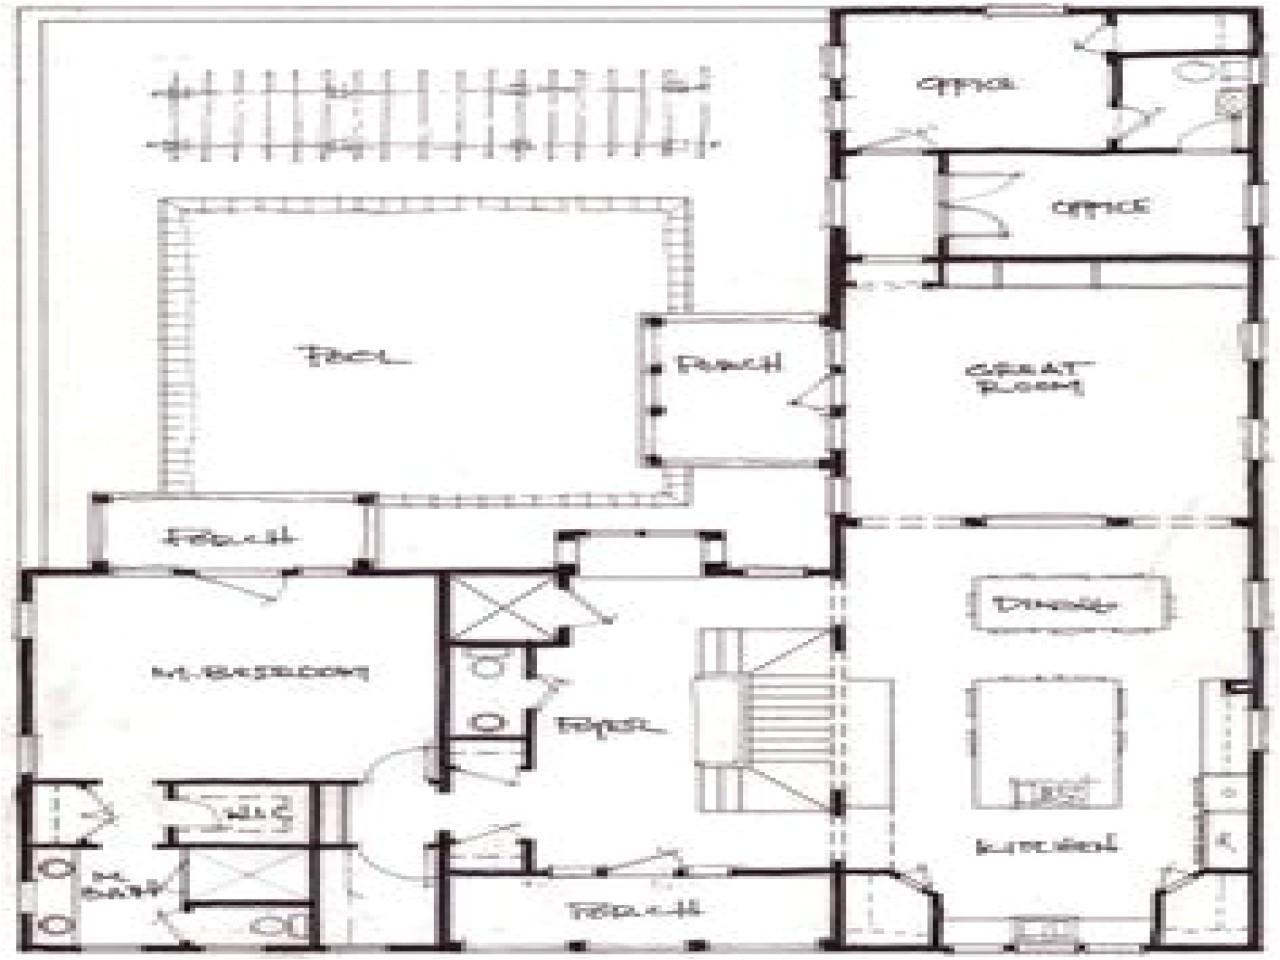 9c300f4adc20a036 l shaped house plans designs best l shaped house plans